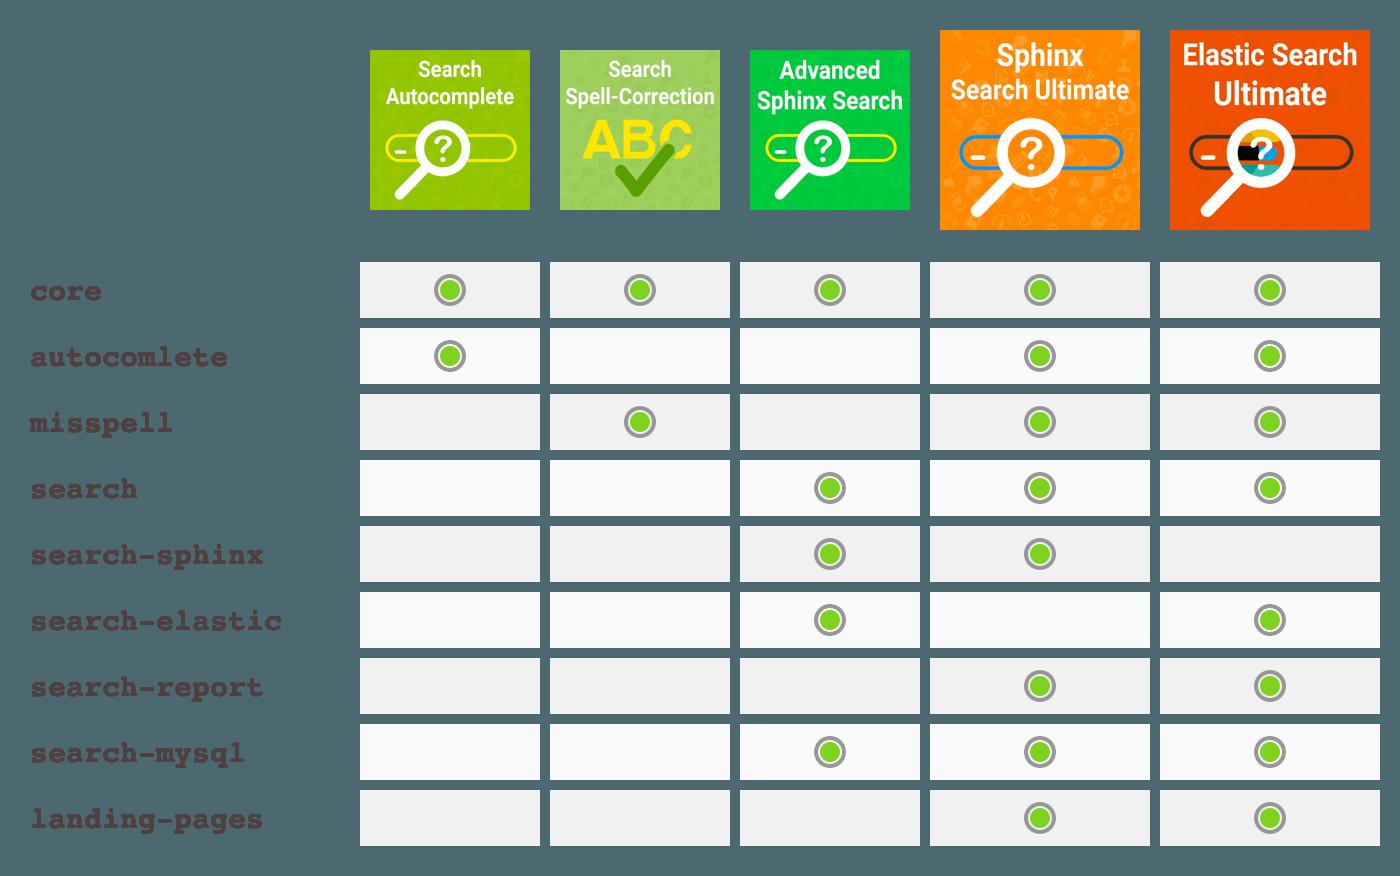 Comparison of all Mirasvit search extensions